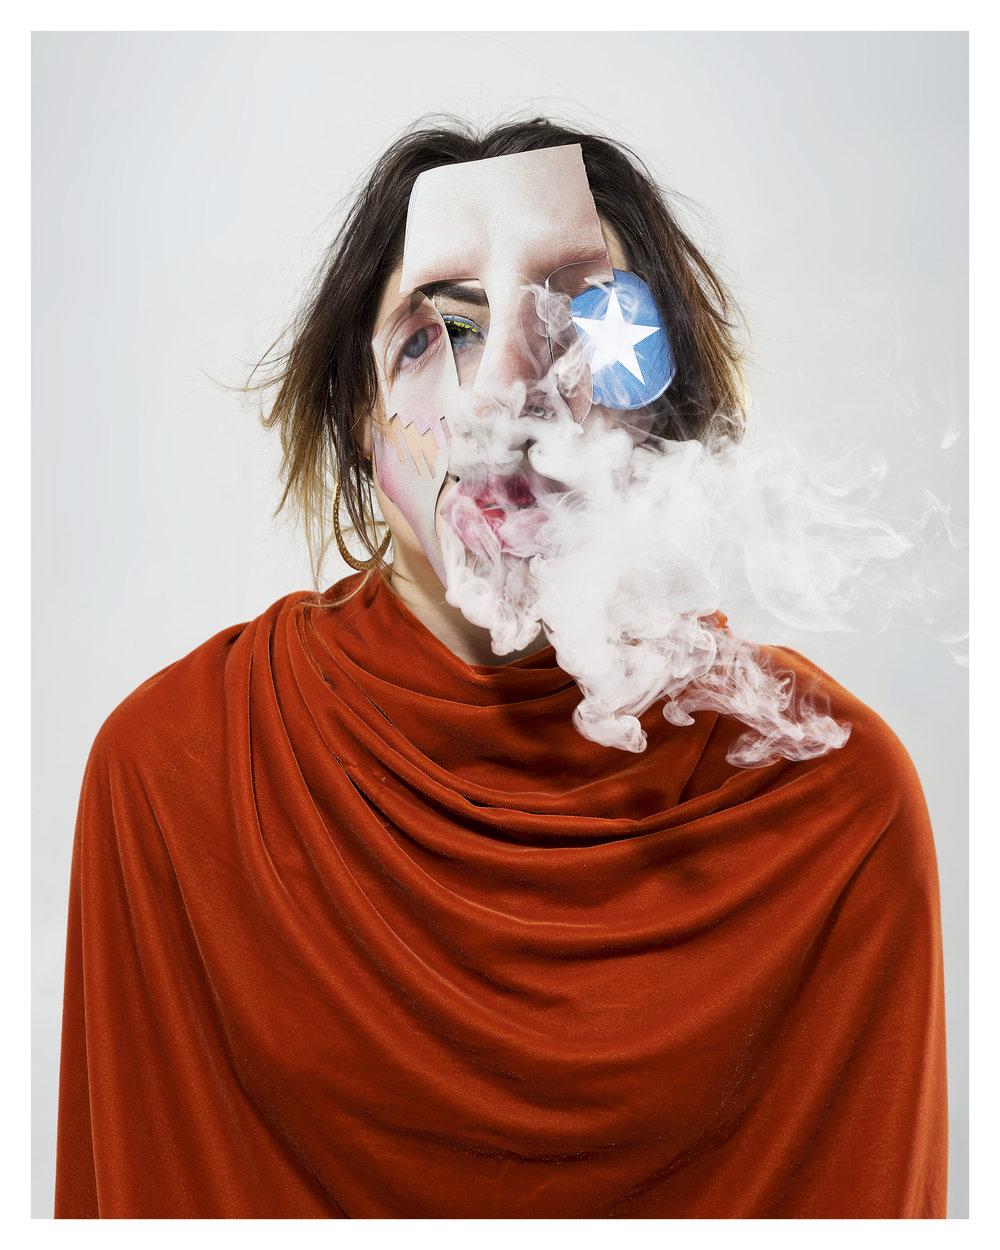 United States of 'I', 28x35 archival pigment print